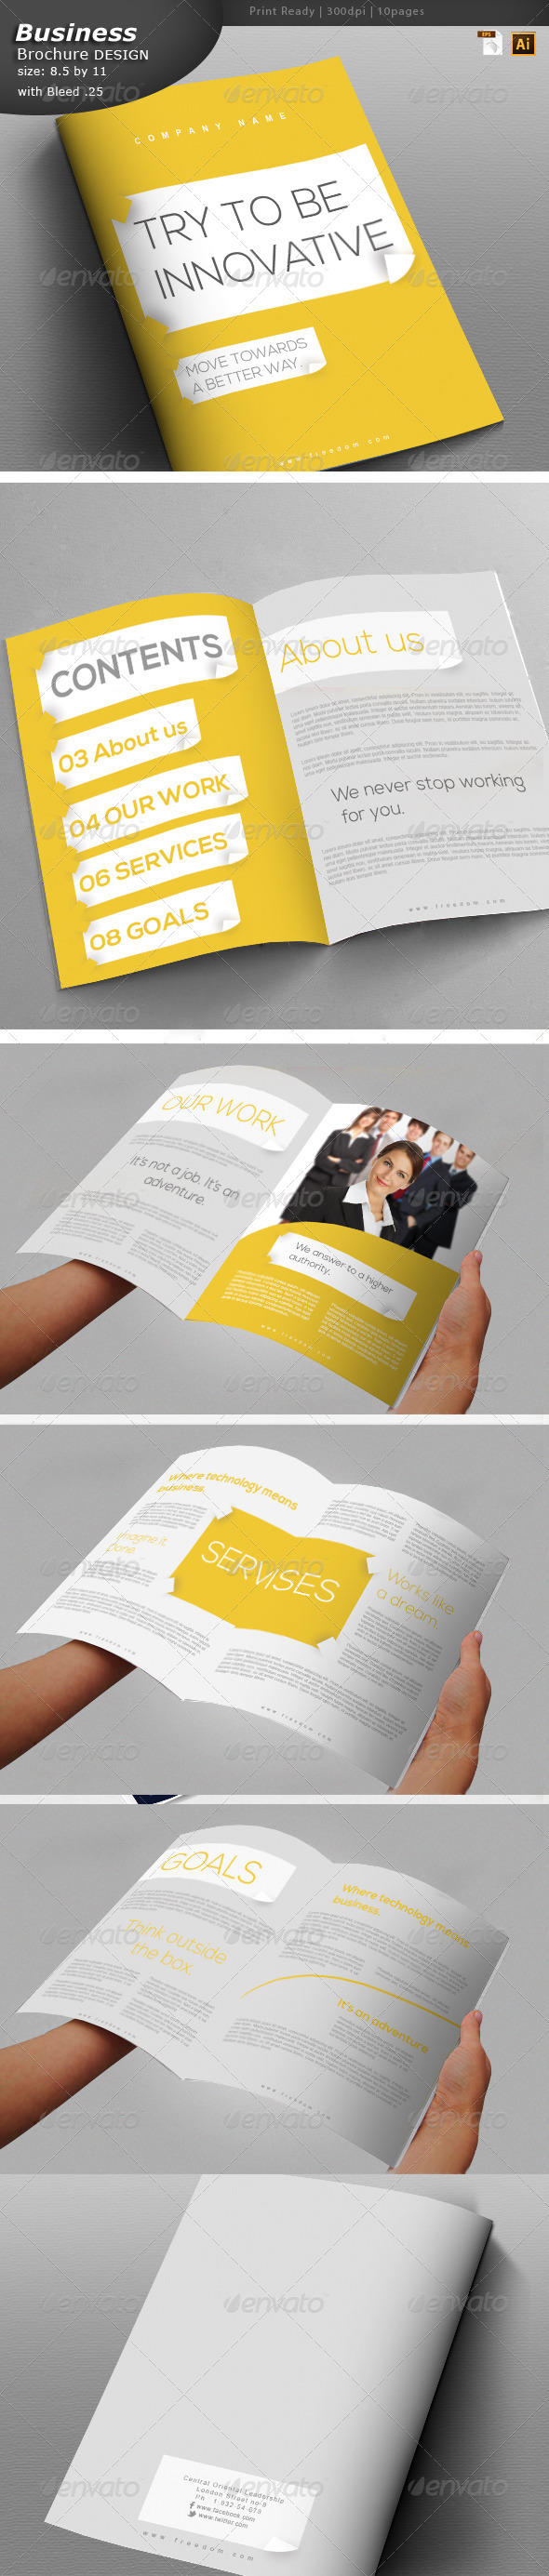 GraphicRiver Business Brochure Design 6052271